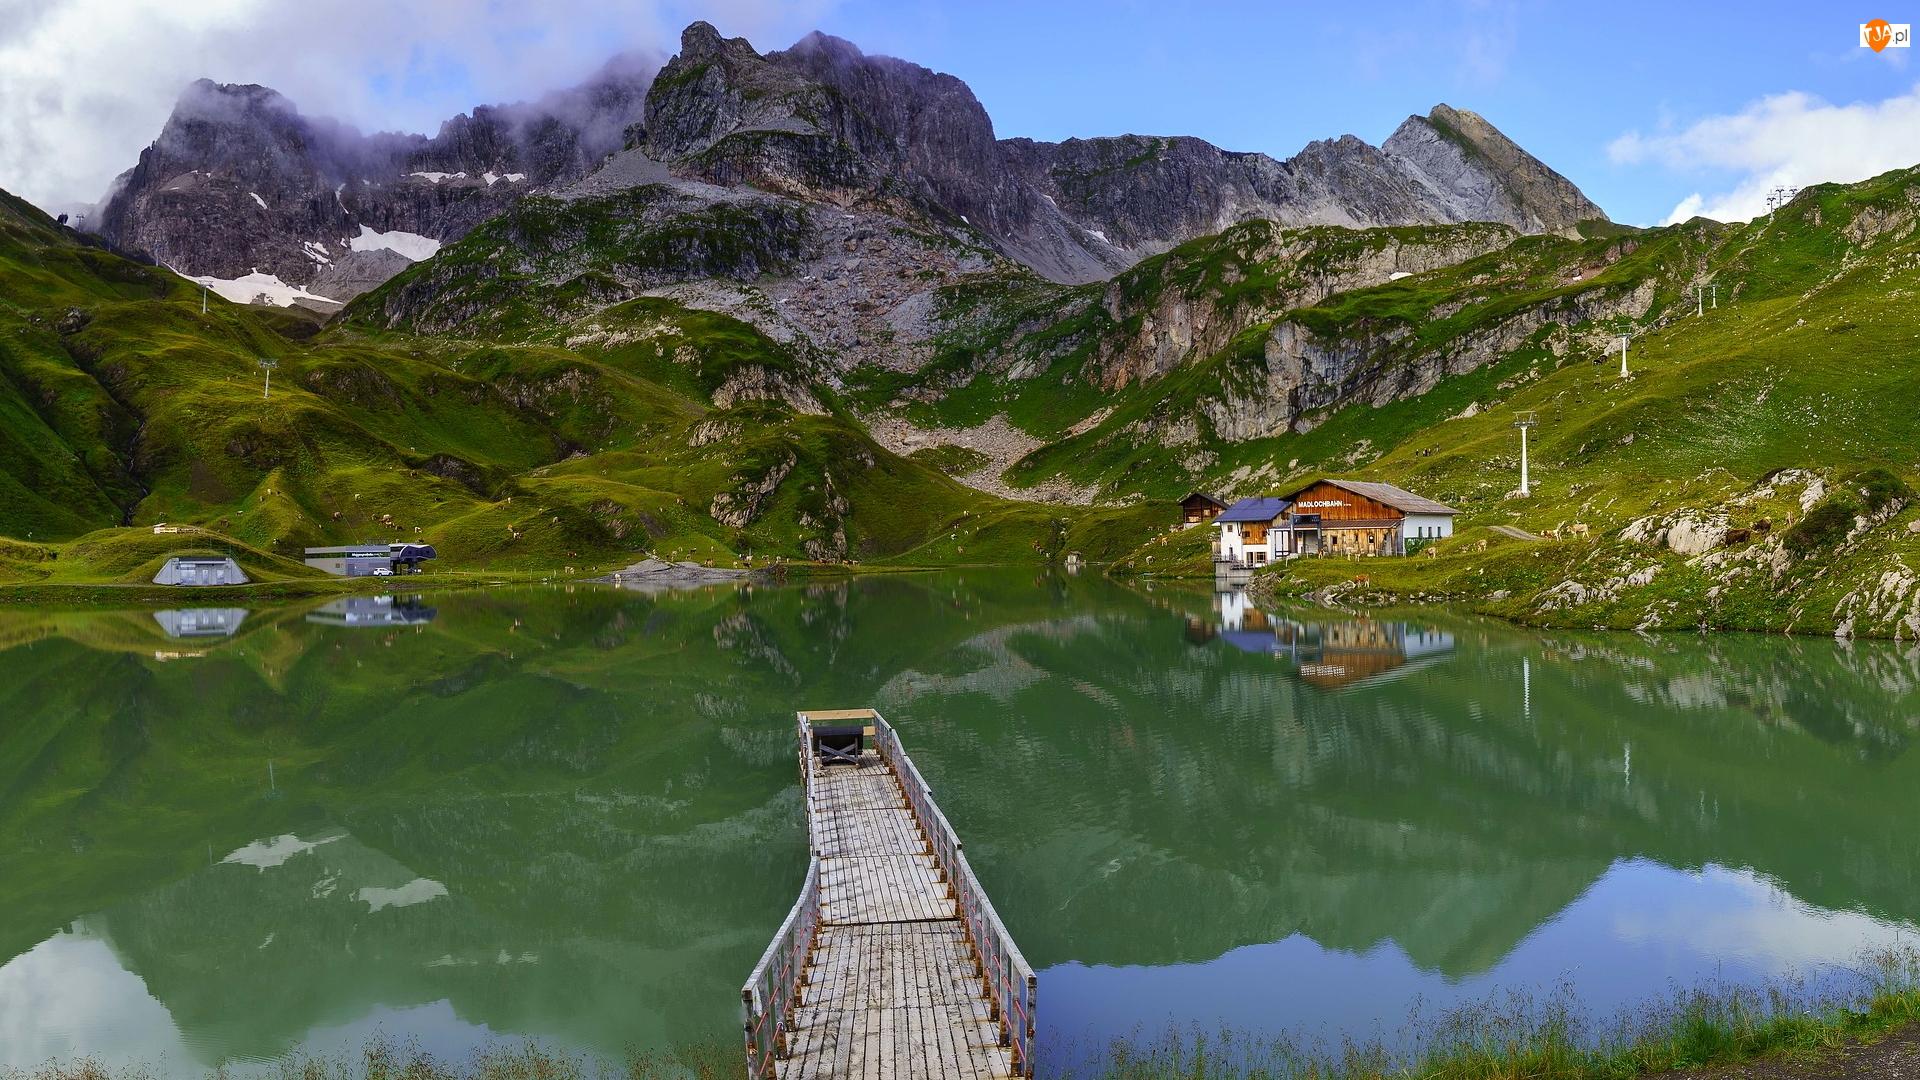 Zurser See, Jezioro, Domy, Austria, Pomost, Góry